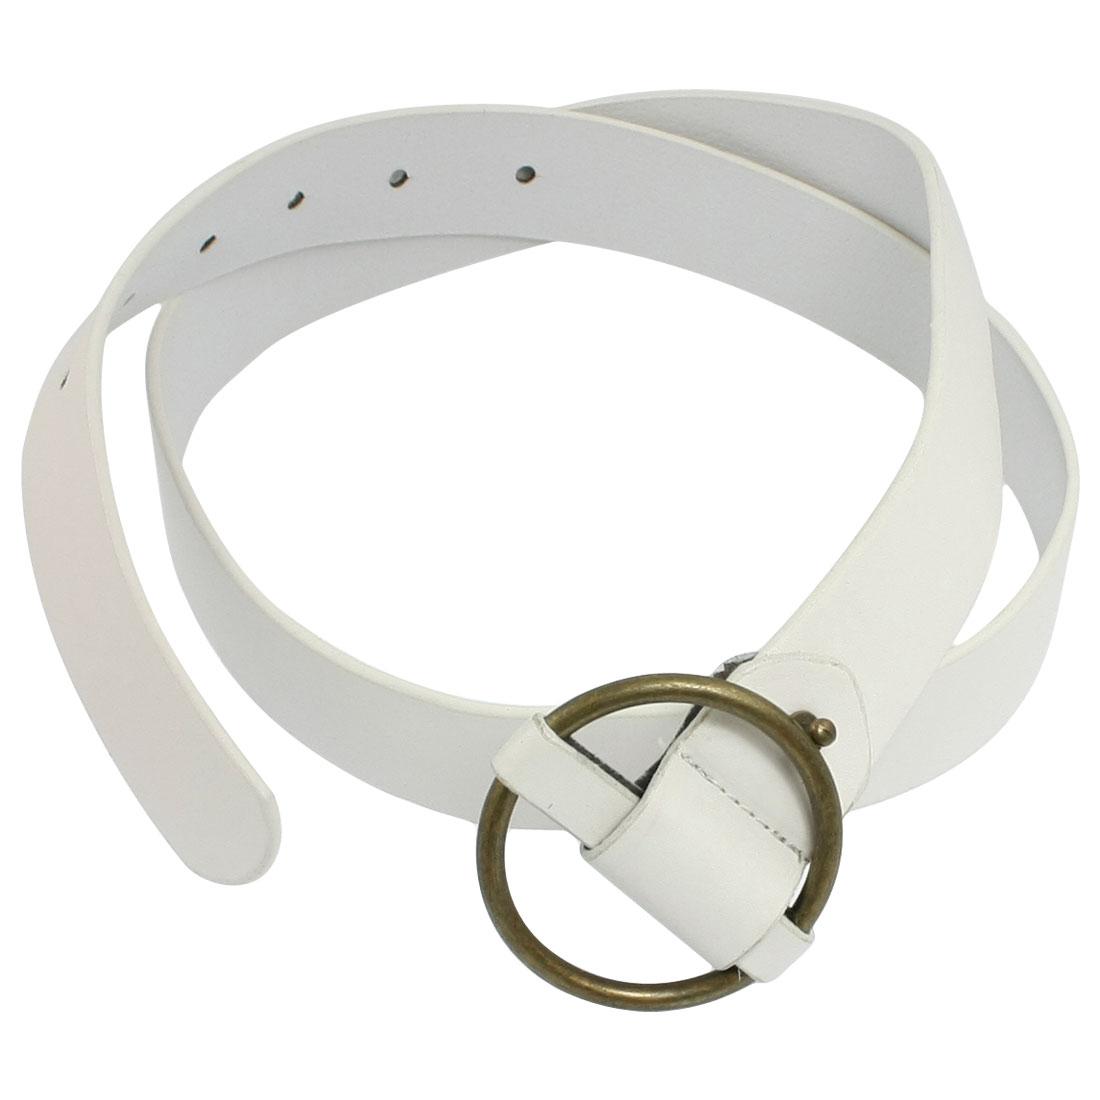 Ladies White Faux Leather Interlocking Buckle Adjustable Waist Belt